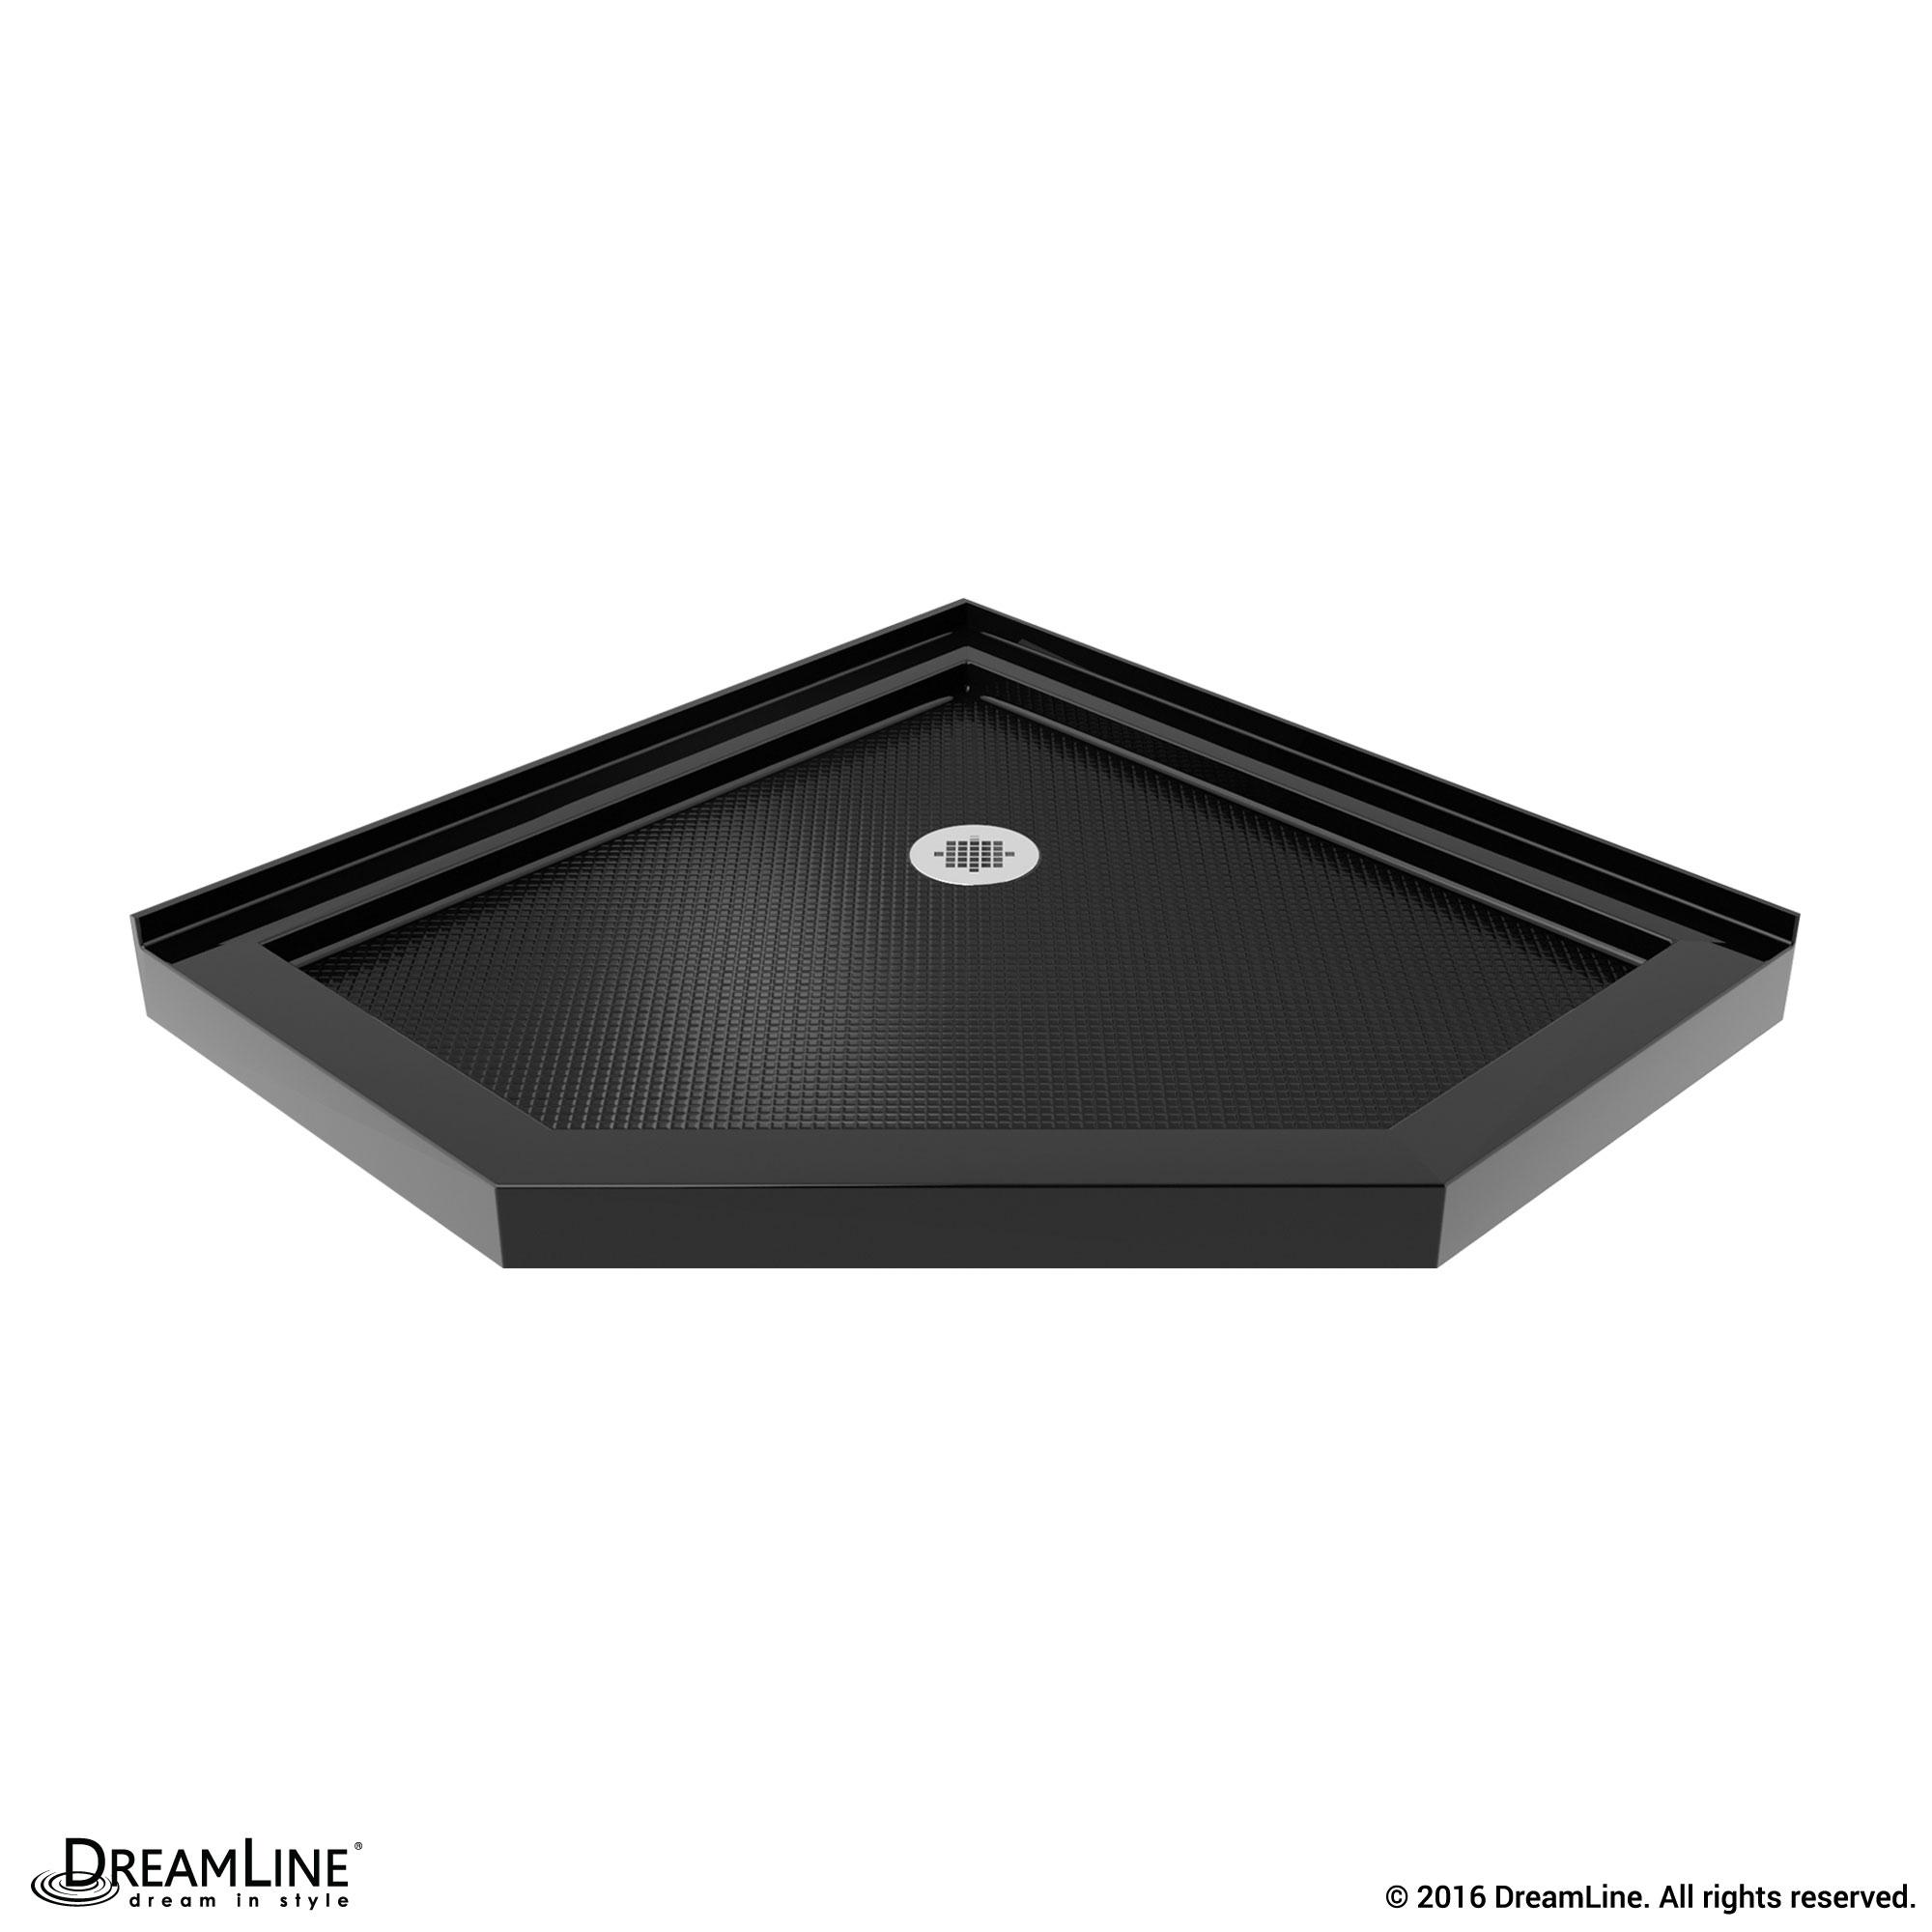 DreamLine SlimLine 38 in. by 38 in. Neo-Angle Shower Tray in Black ...